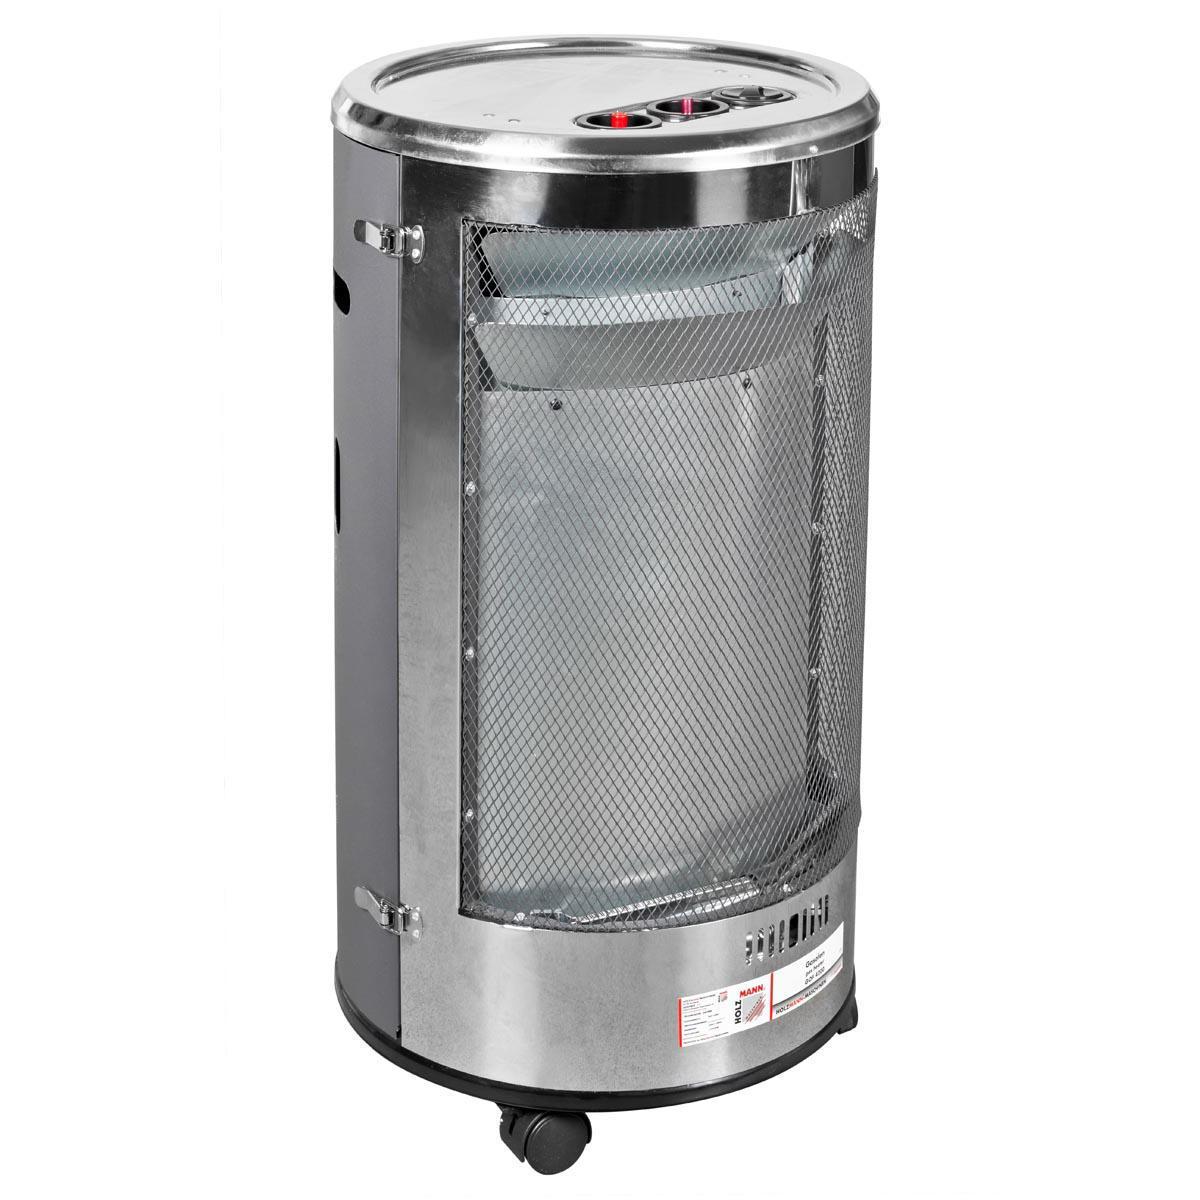 GOF4200 Gas varmer Holzmann